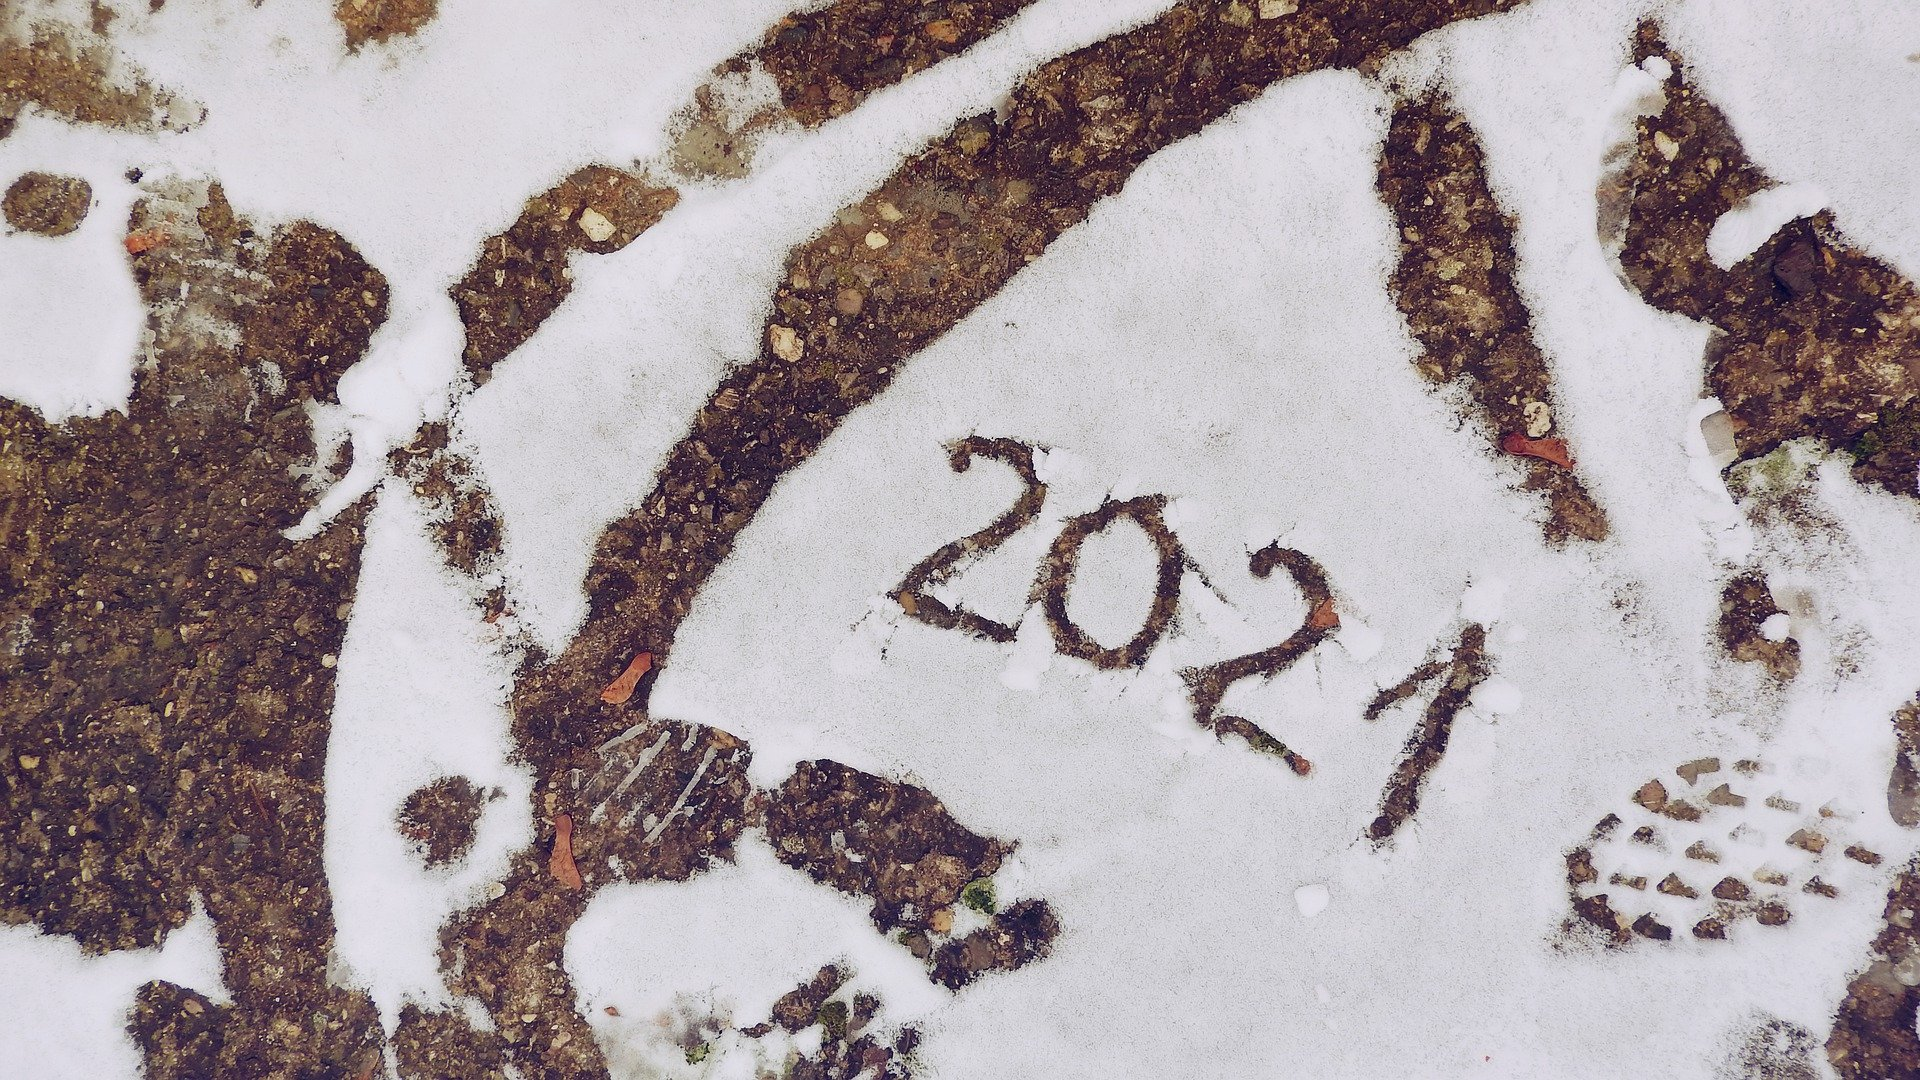 snow-5820403_1920